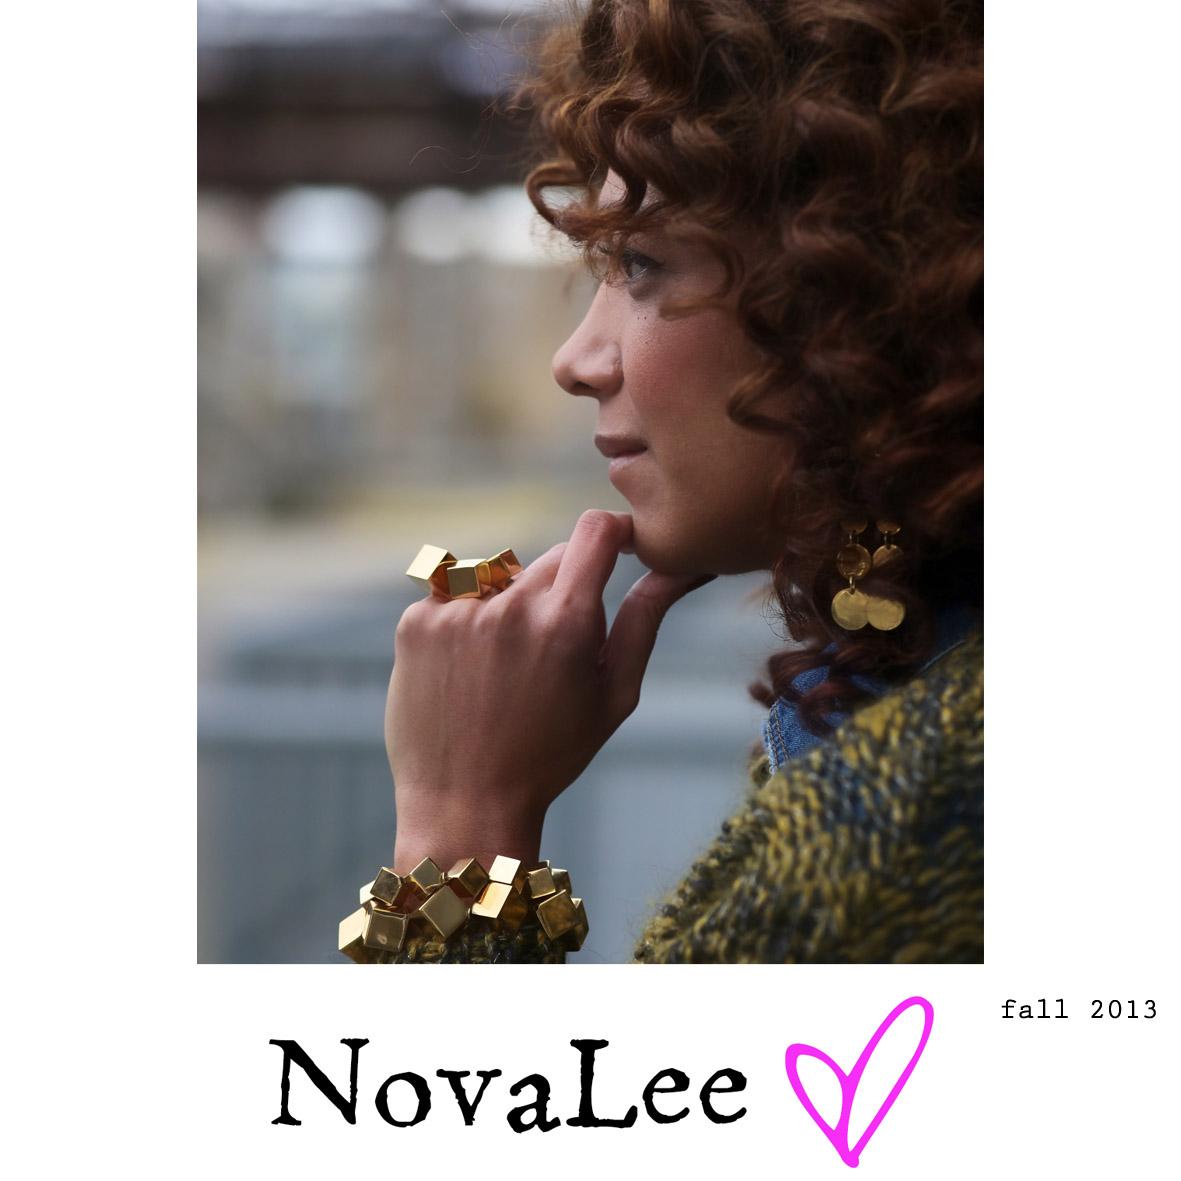 novalee fall 2013-01.jpg